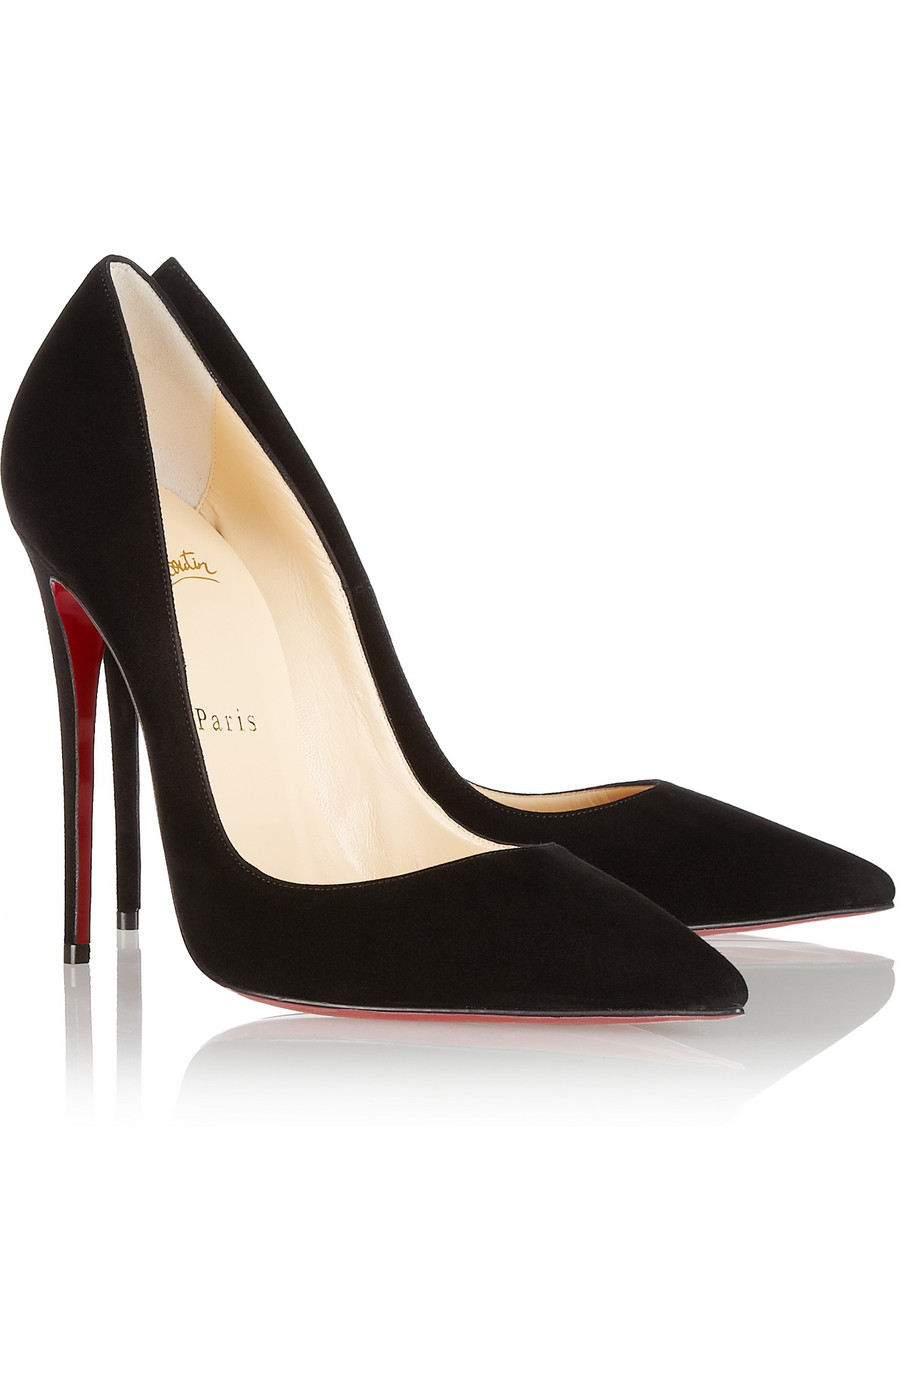 3ac2193a2 CHRISTIAN LOUBOUTIN SO KATE BLACK SUEDE - Reed Fashion Blog